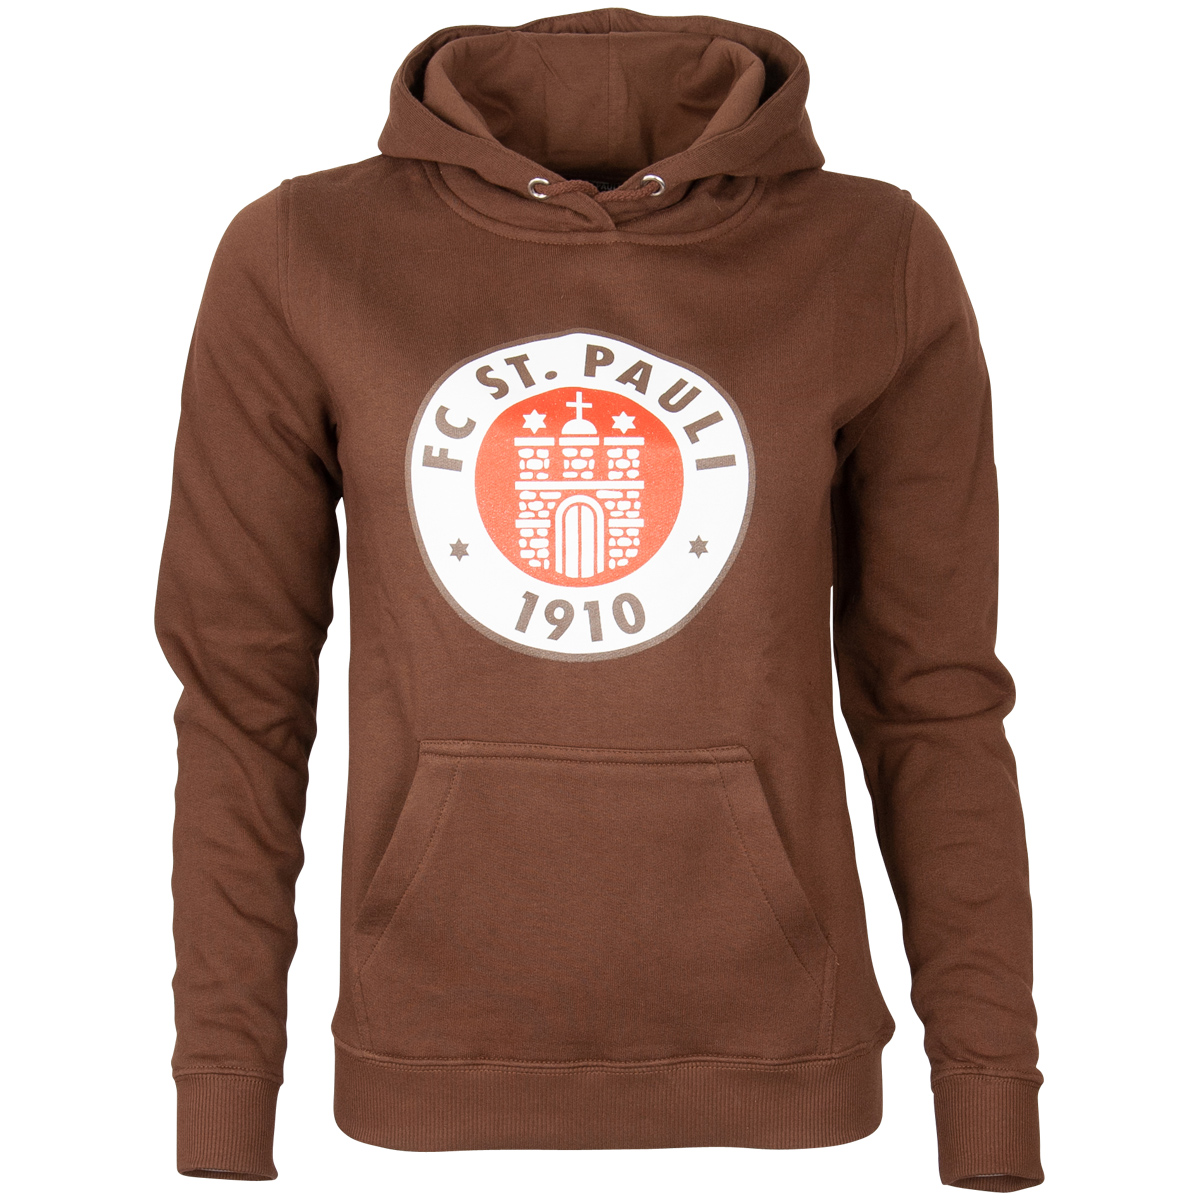 FC St. Pauli - Damen Kapuzenpullover Logo - braun